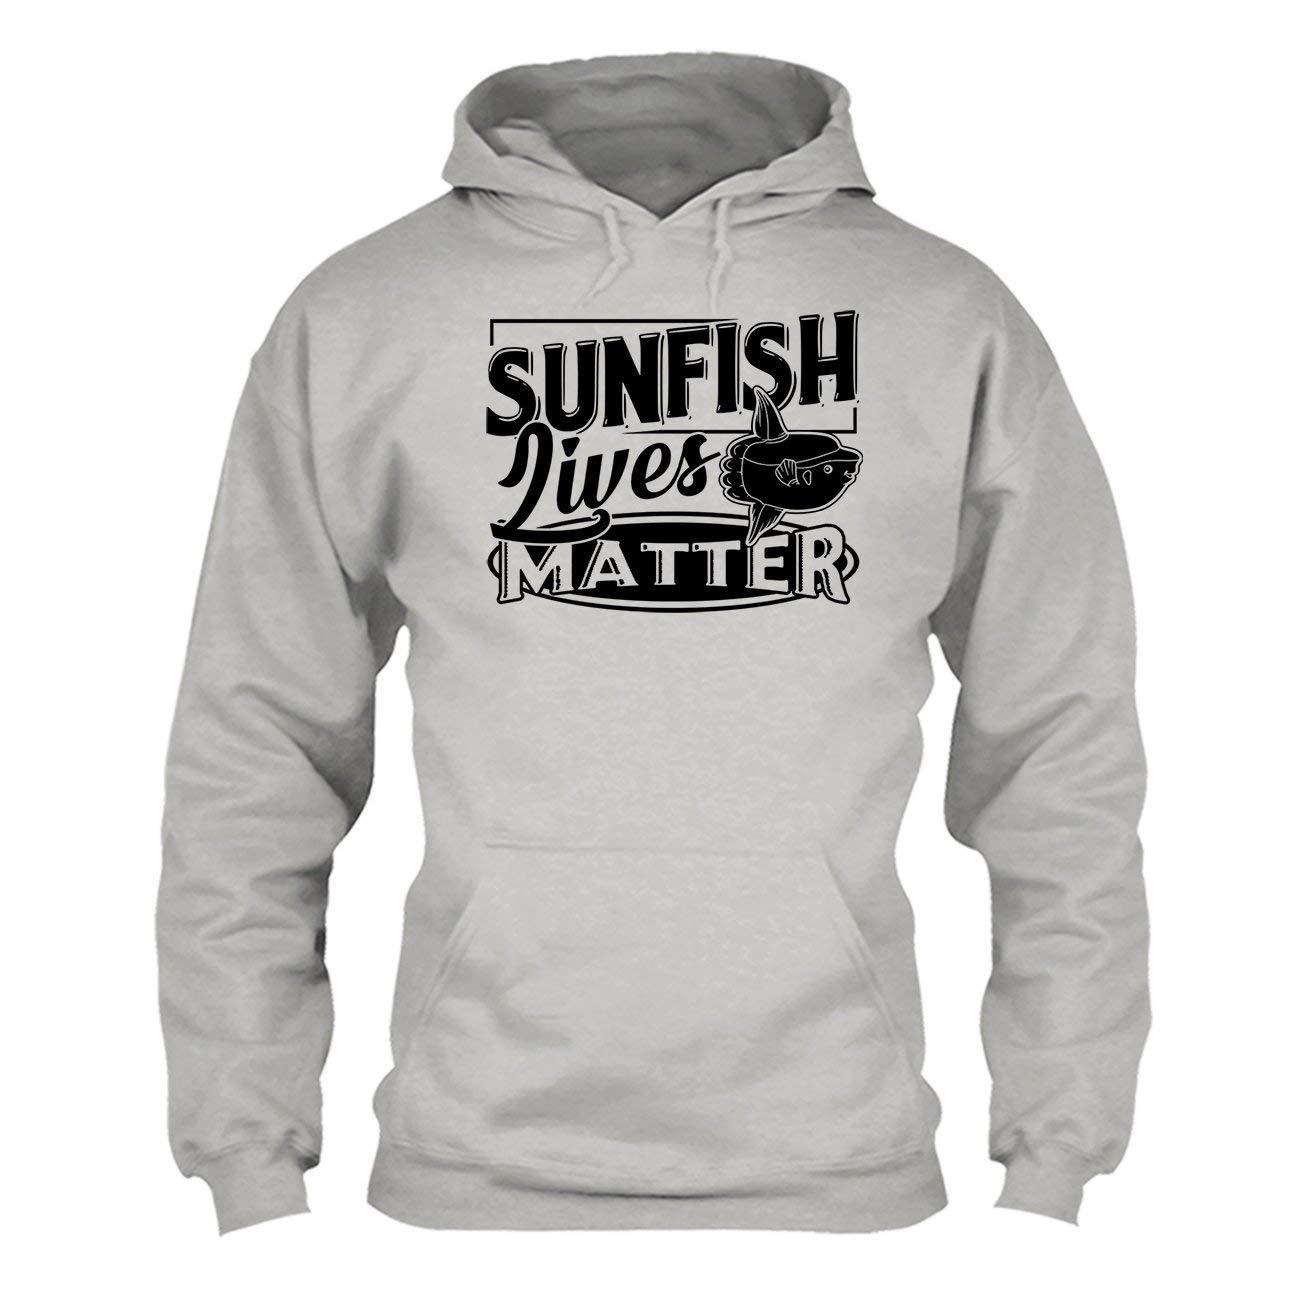 Tee Shirt Clothing Sunfish Lives Matter Shirt